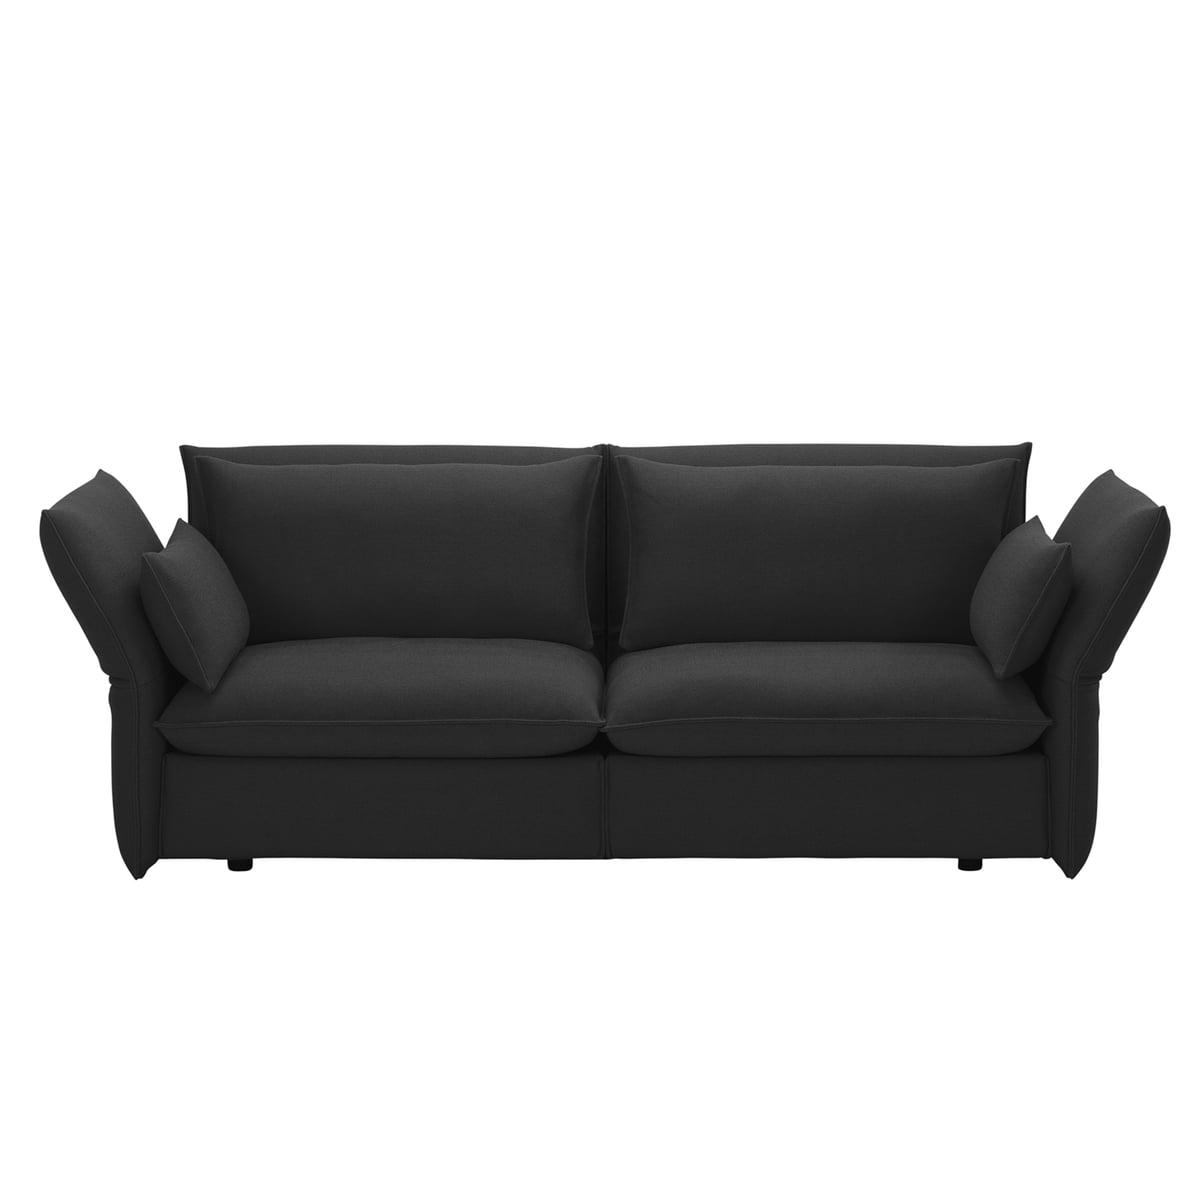 Vitra Mariposa Sofa 2 5 Seats Laser Dark Grey